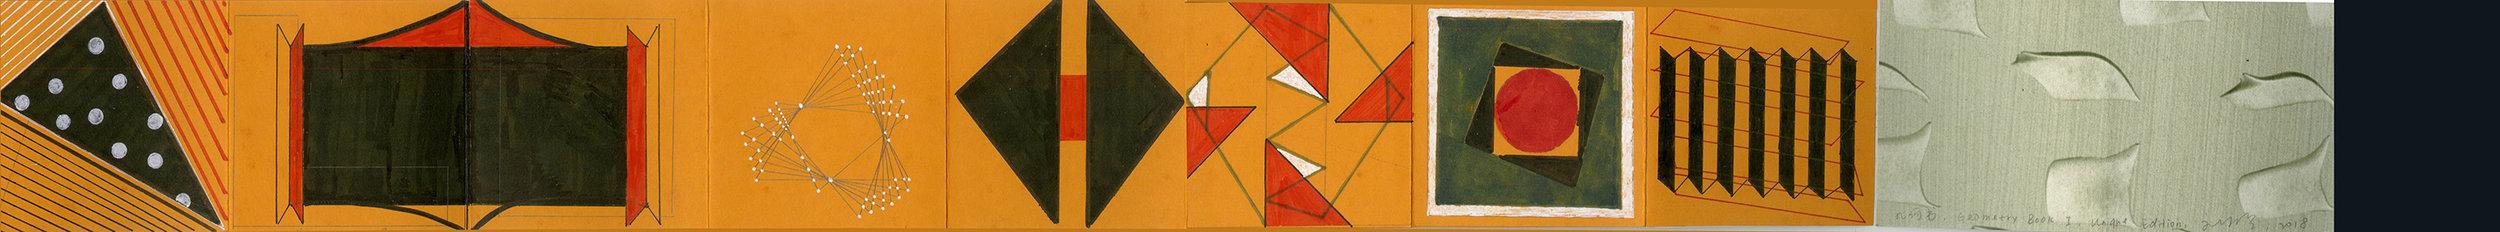 geometry book 1_side A2.jpg